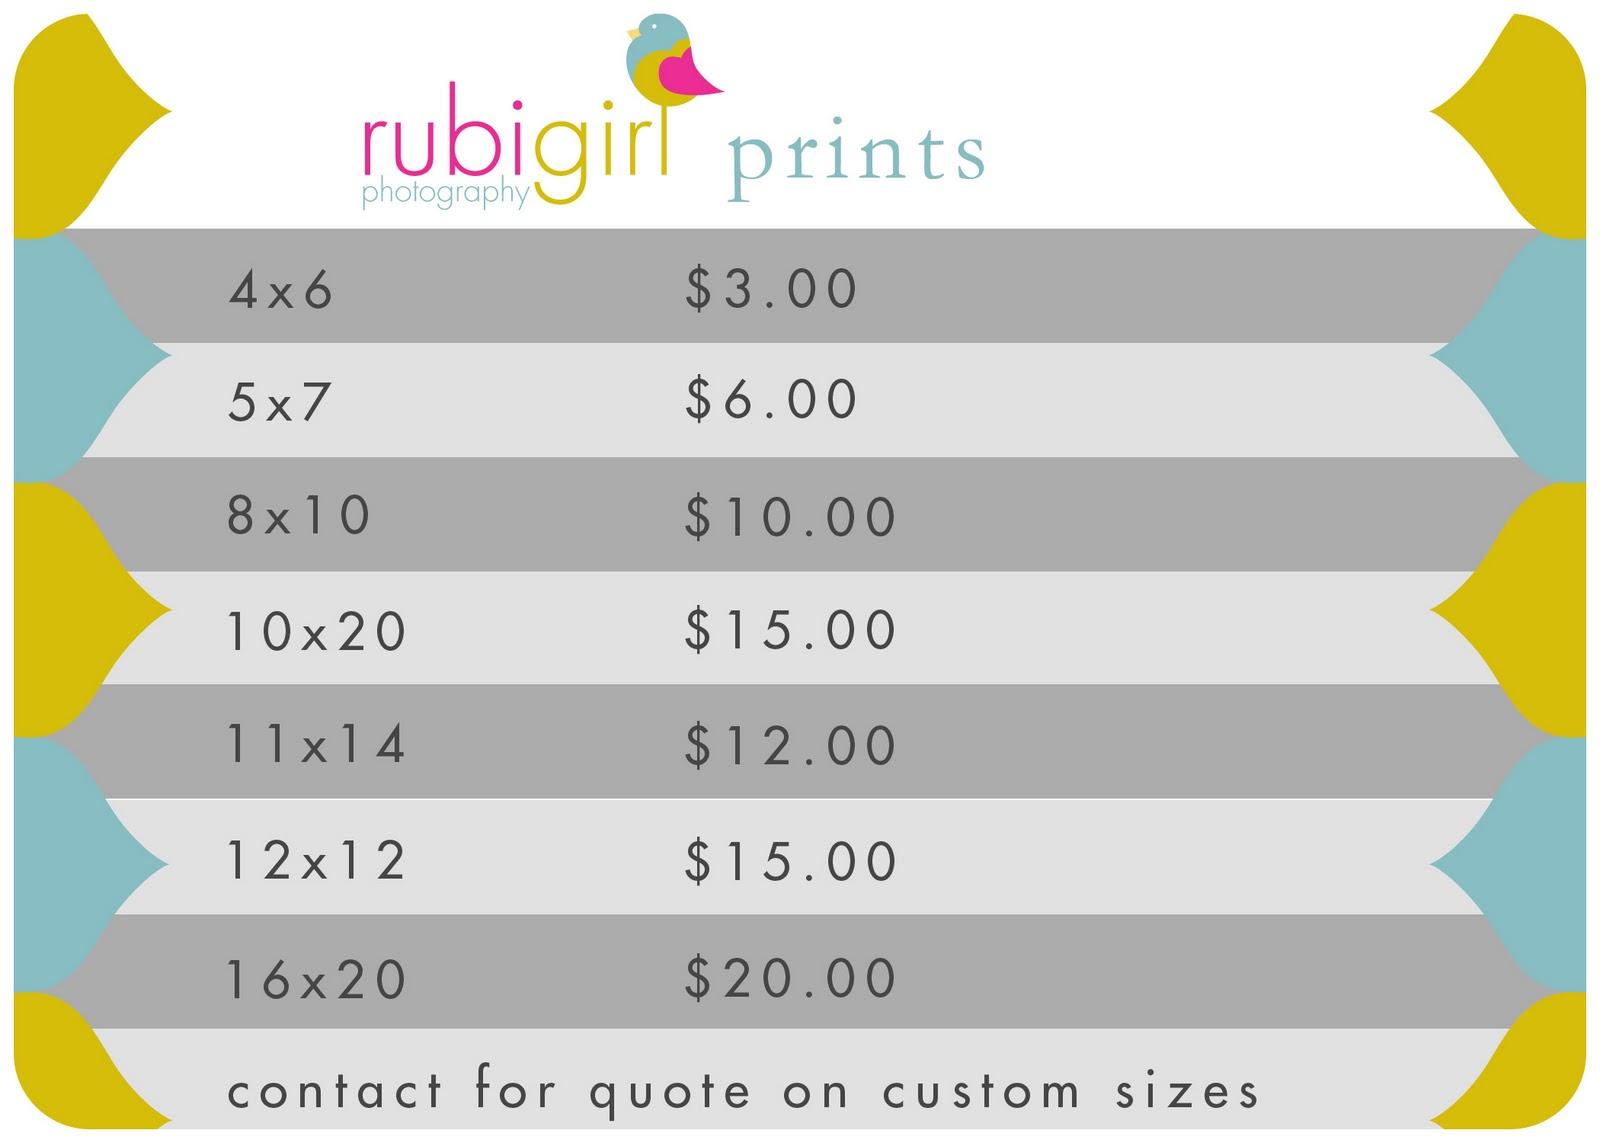 rubigirl photography print price list. Black Bedroom Furniture Sets. Home Design Ideas